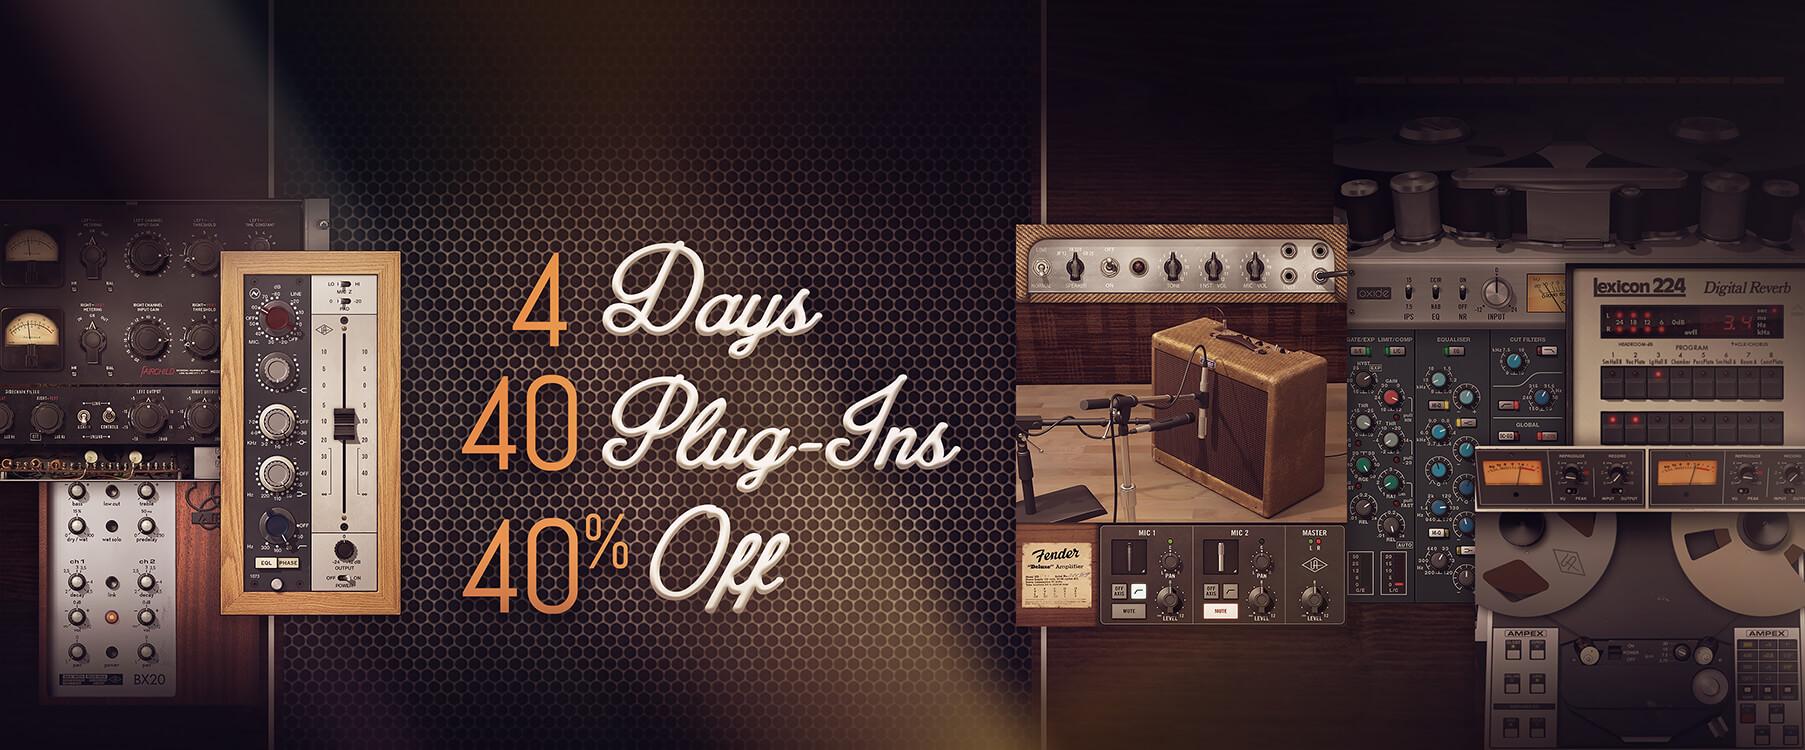 Universal Audio 40プラグインが40%OFF